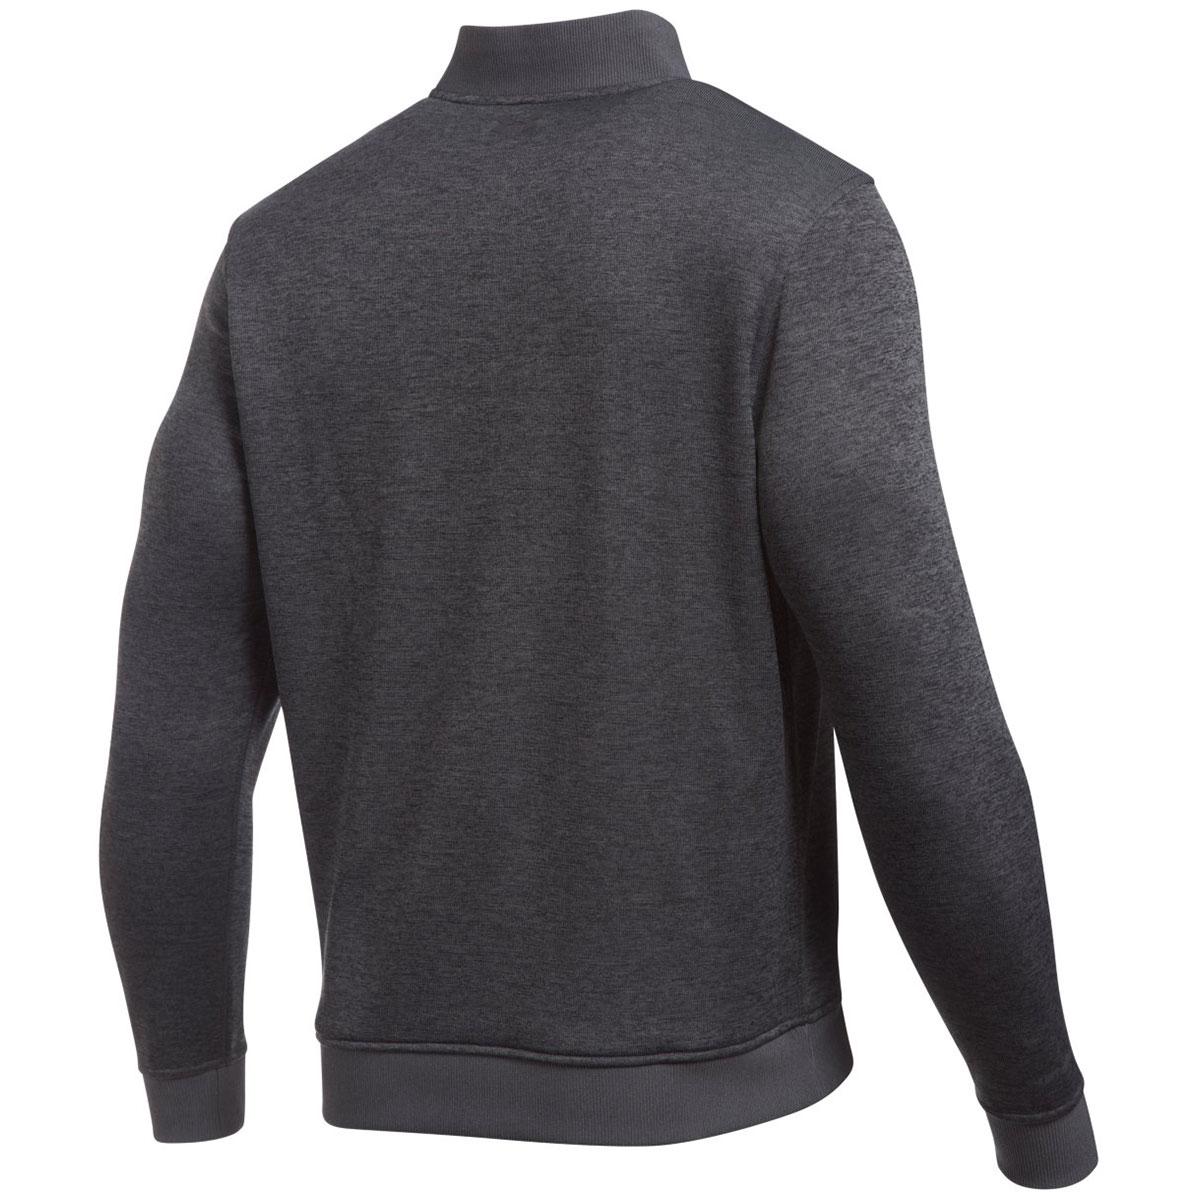 Under-Armour-Mens-UA-Storm-Sweater-Fleece-1-4-Zip-Pullover-Jumper-25-OFF-RRP thumbnail 14